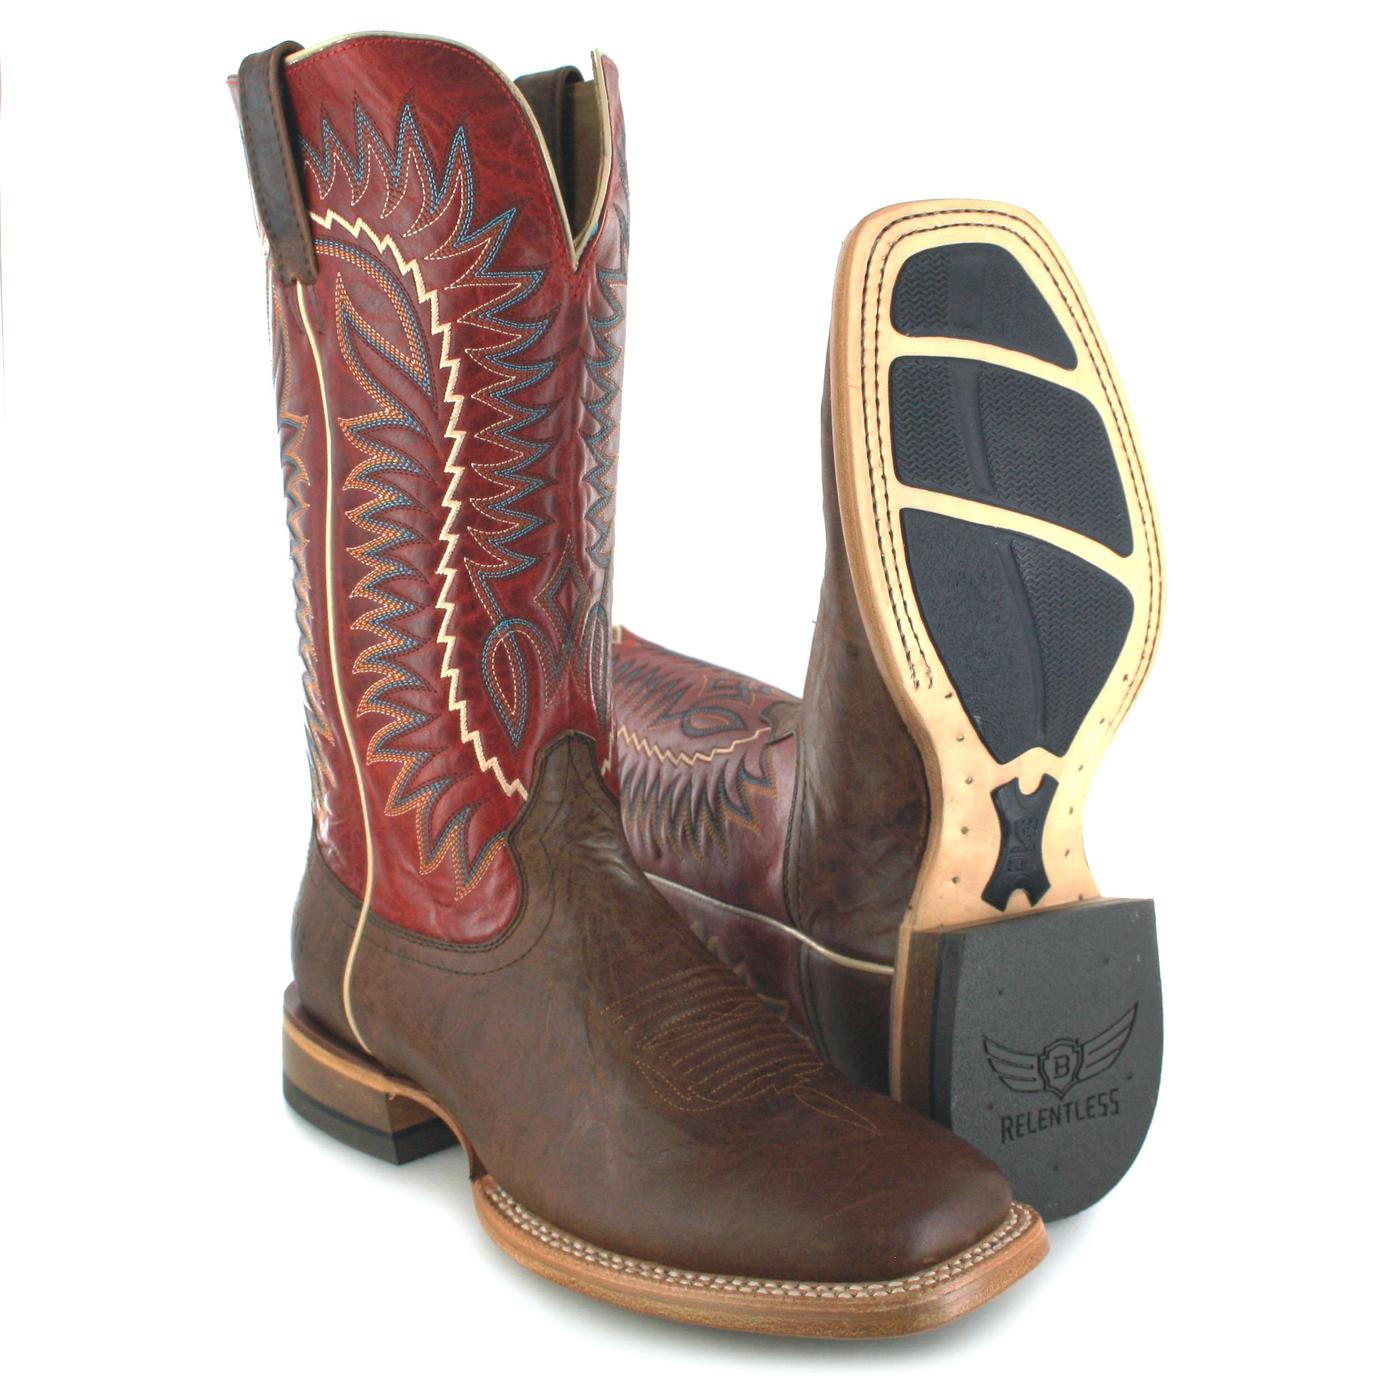 41f1569becb Ariat RELENTLESS ELITE 21673 Dust Devil Tan True Red Western riding boot -  brown red